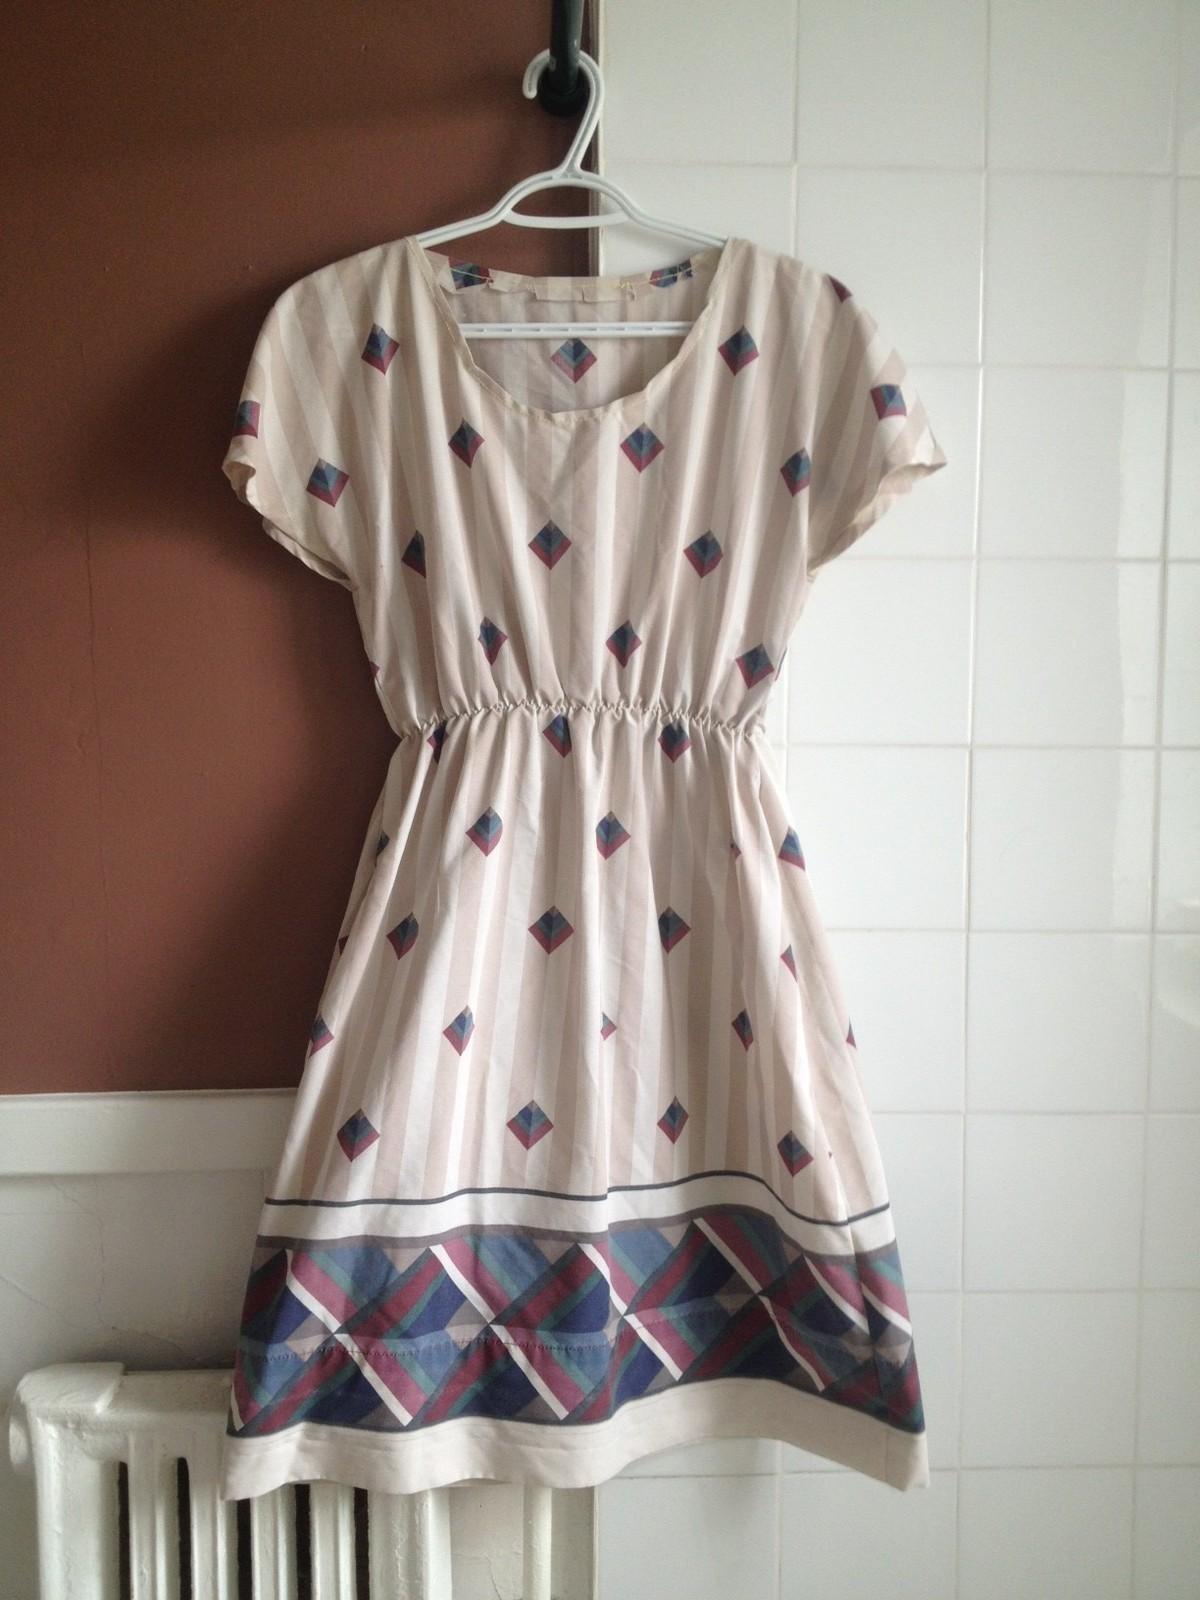 Bedsheet Dress How To Recycle A Sheet Dress